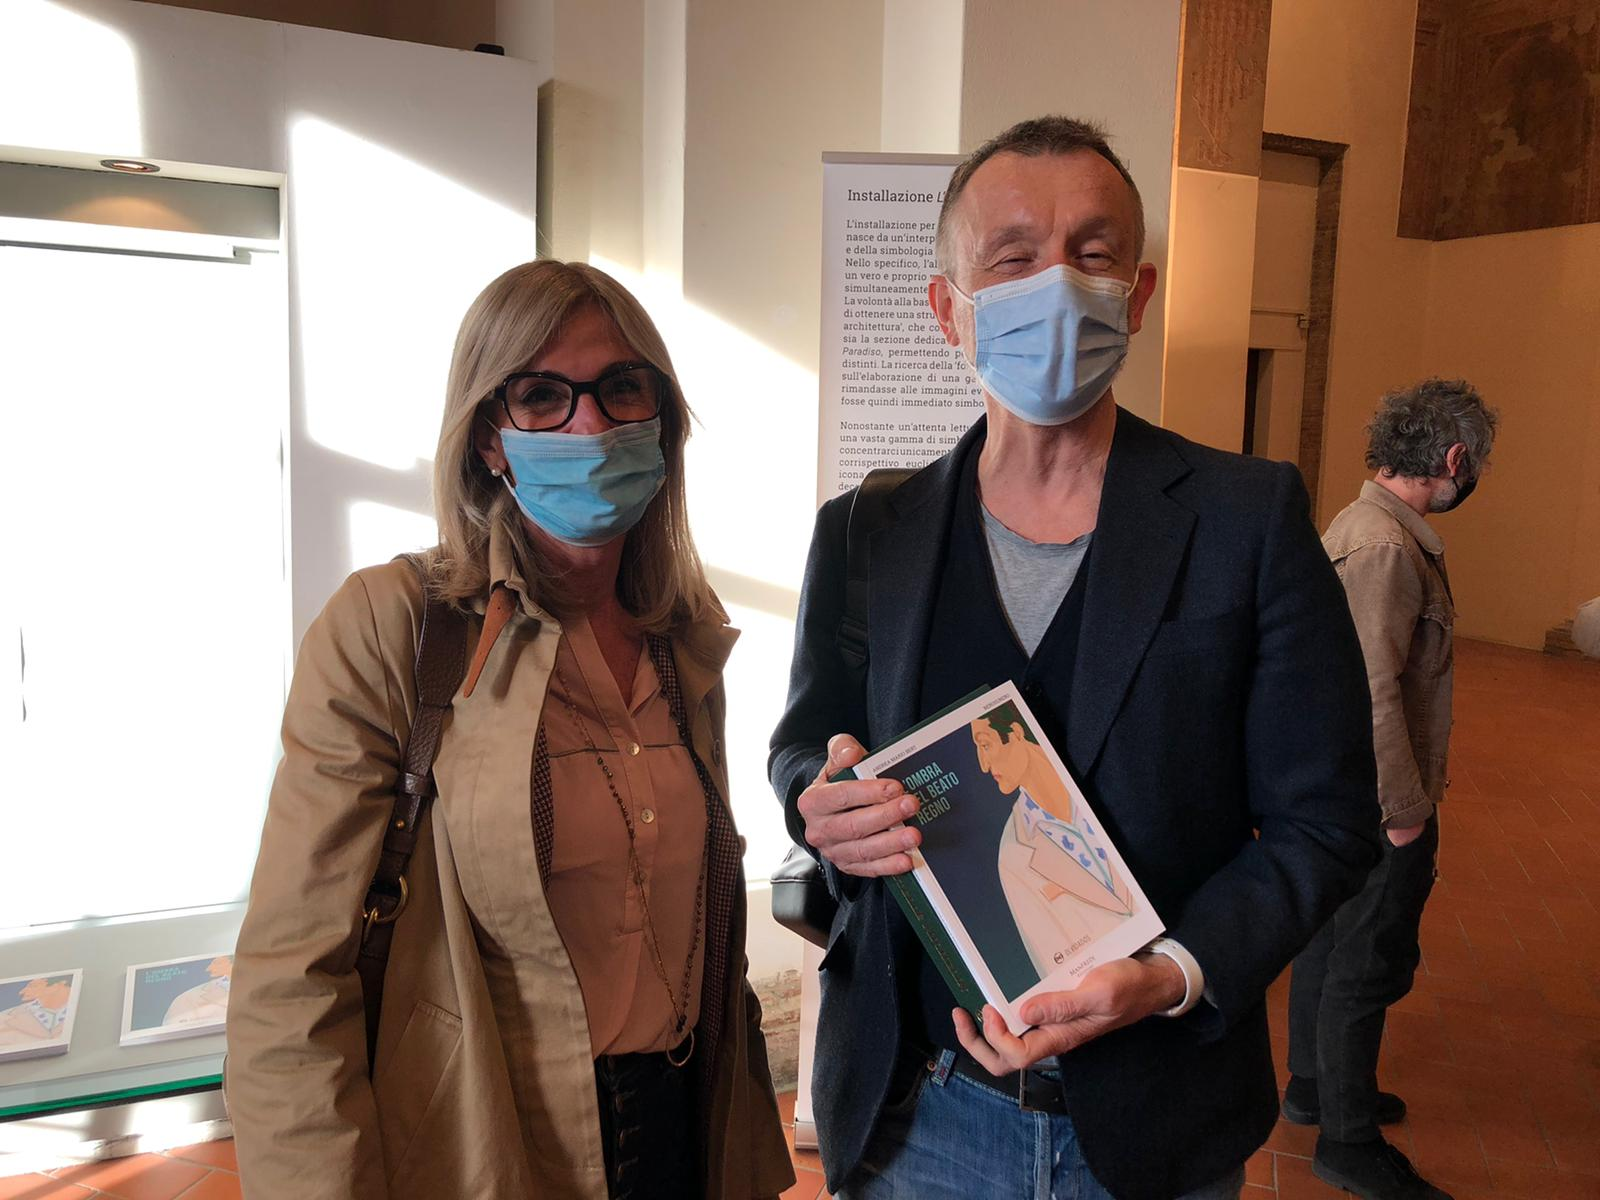 Forlì le mostre d'arte cittadine Valerio Melandri Paola Casara